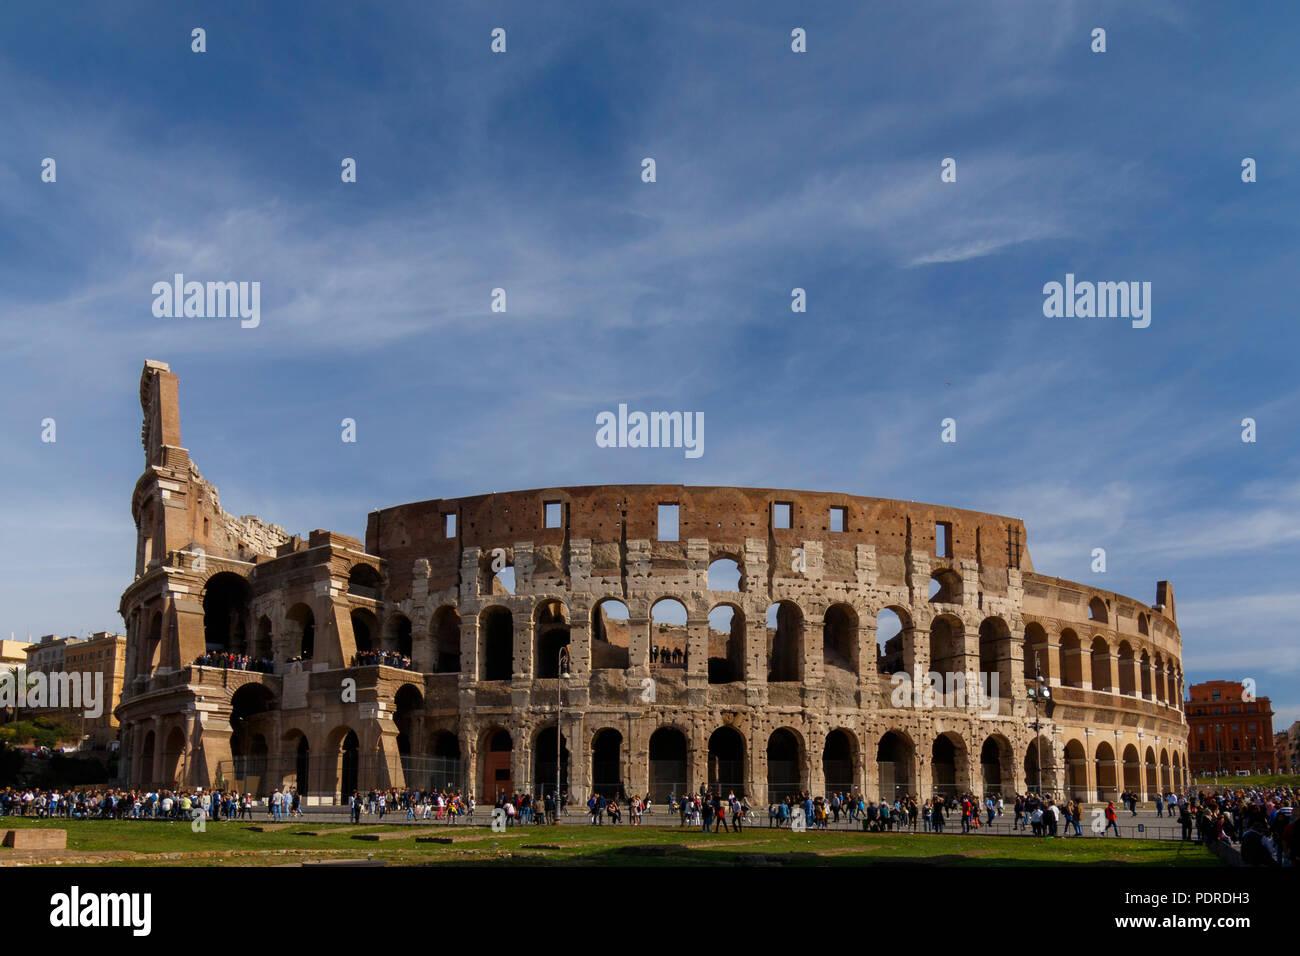 Kolosseum von Rom bei Tageslicht, UNESCO-Weltkulturerbe Rom, Rom, Italien Stockfoto